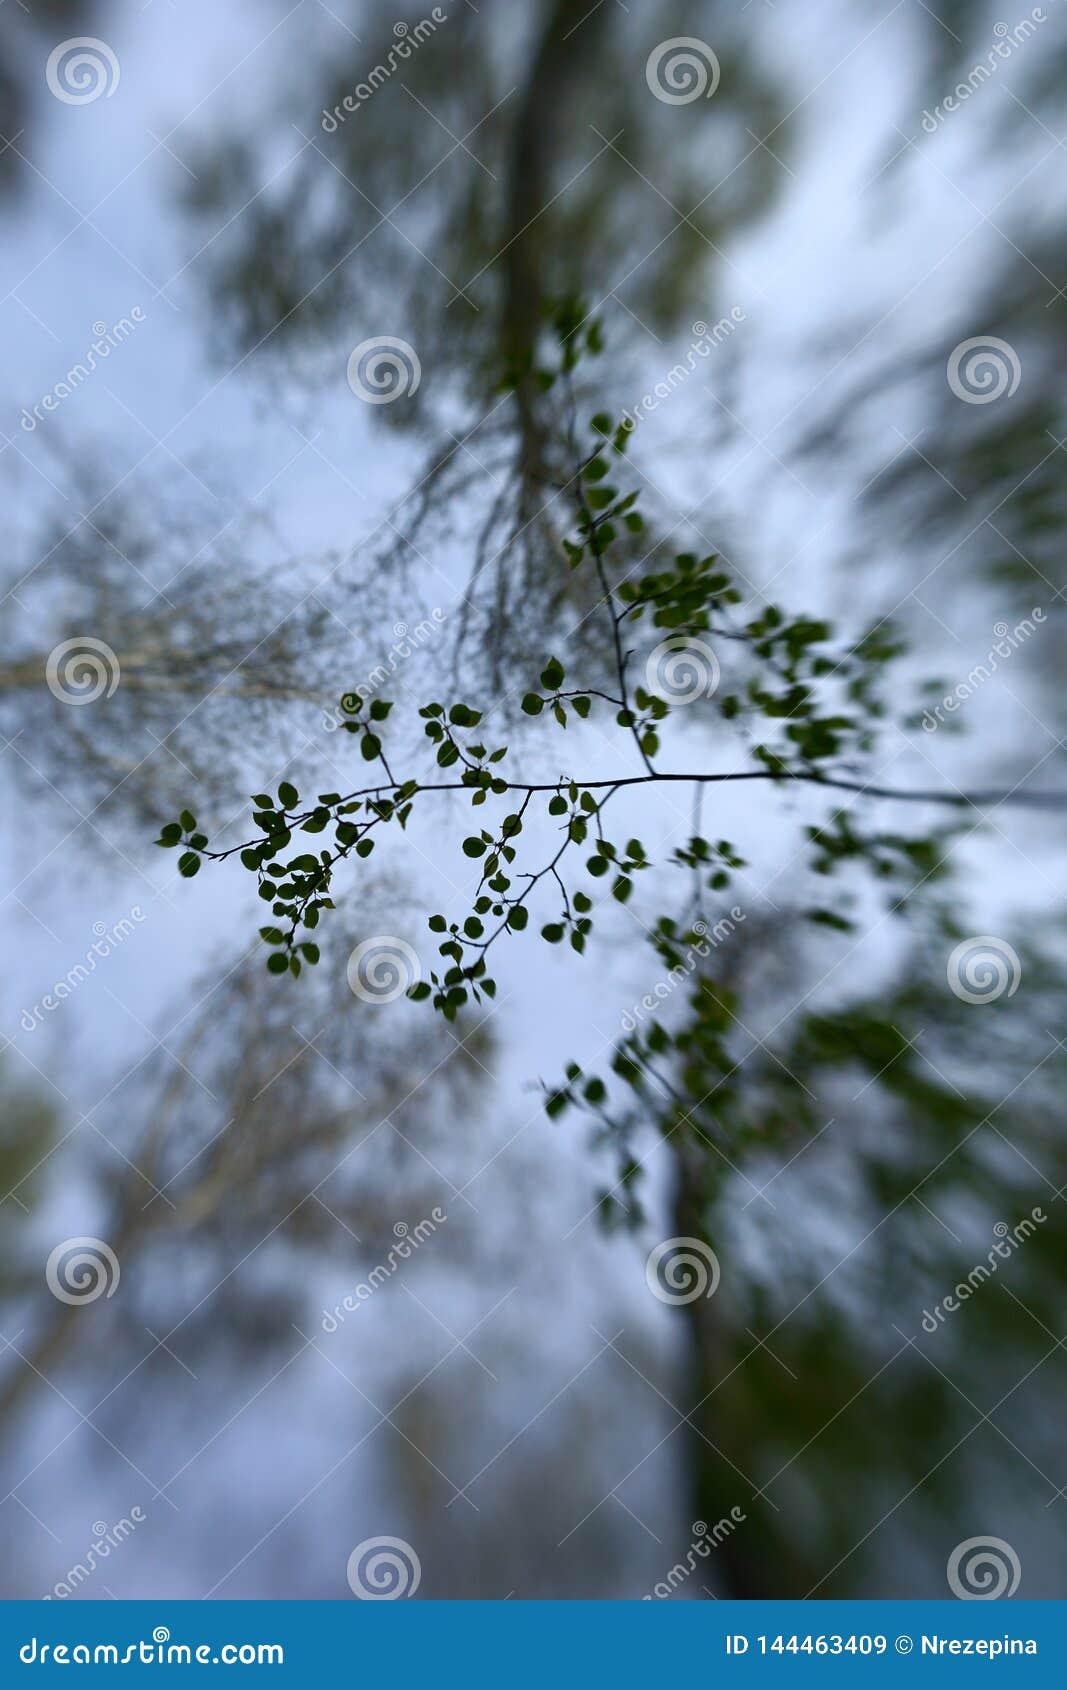 Мягко листья зеленого цвета